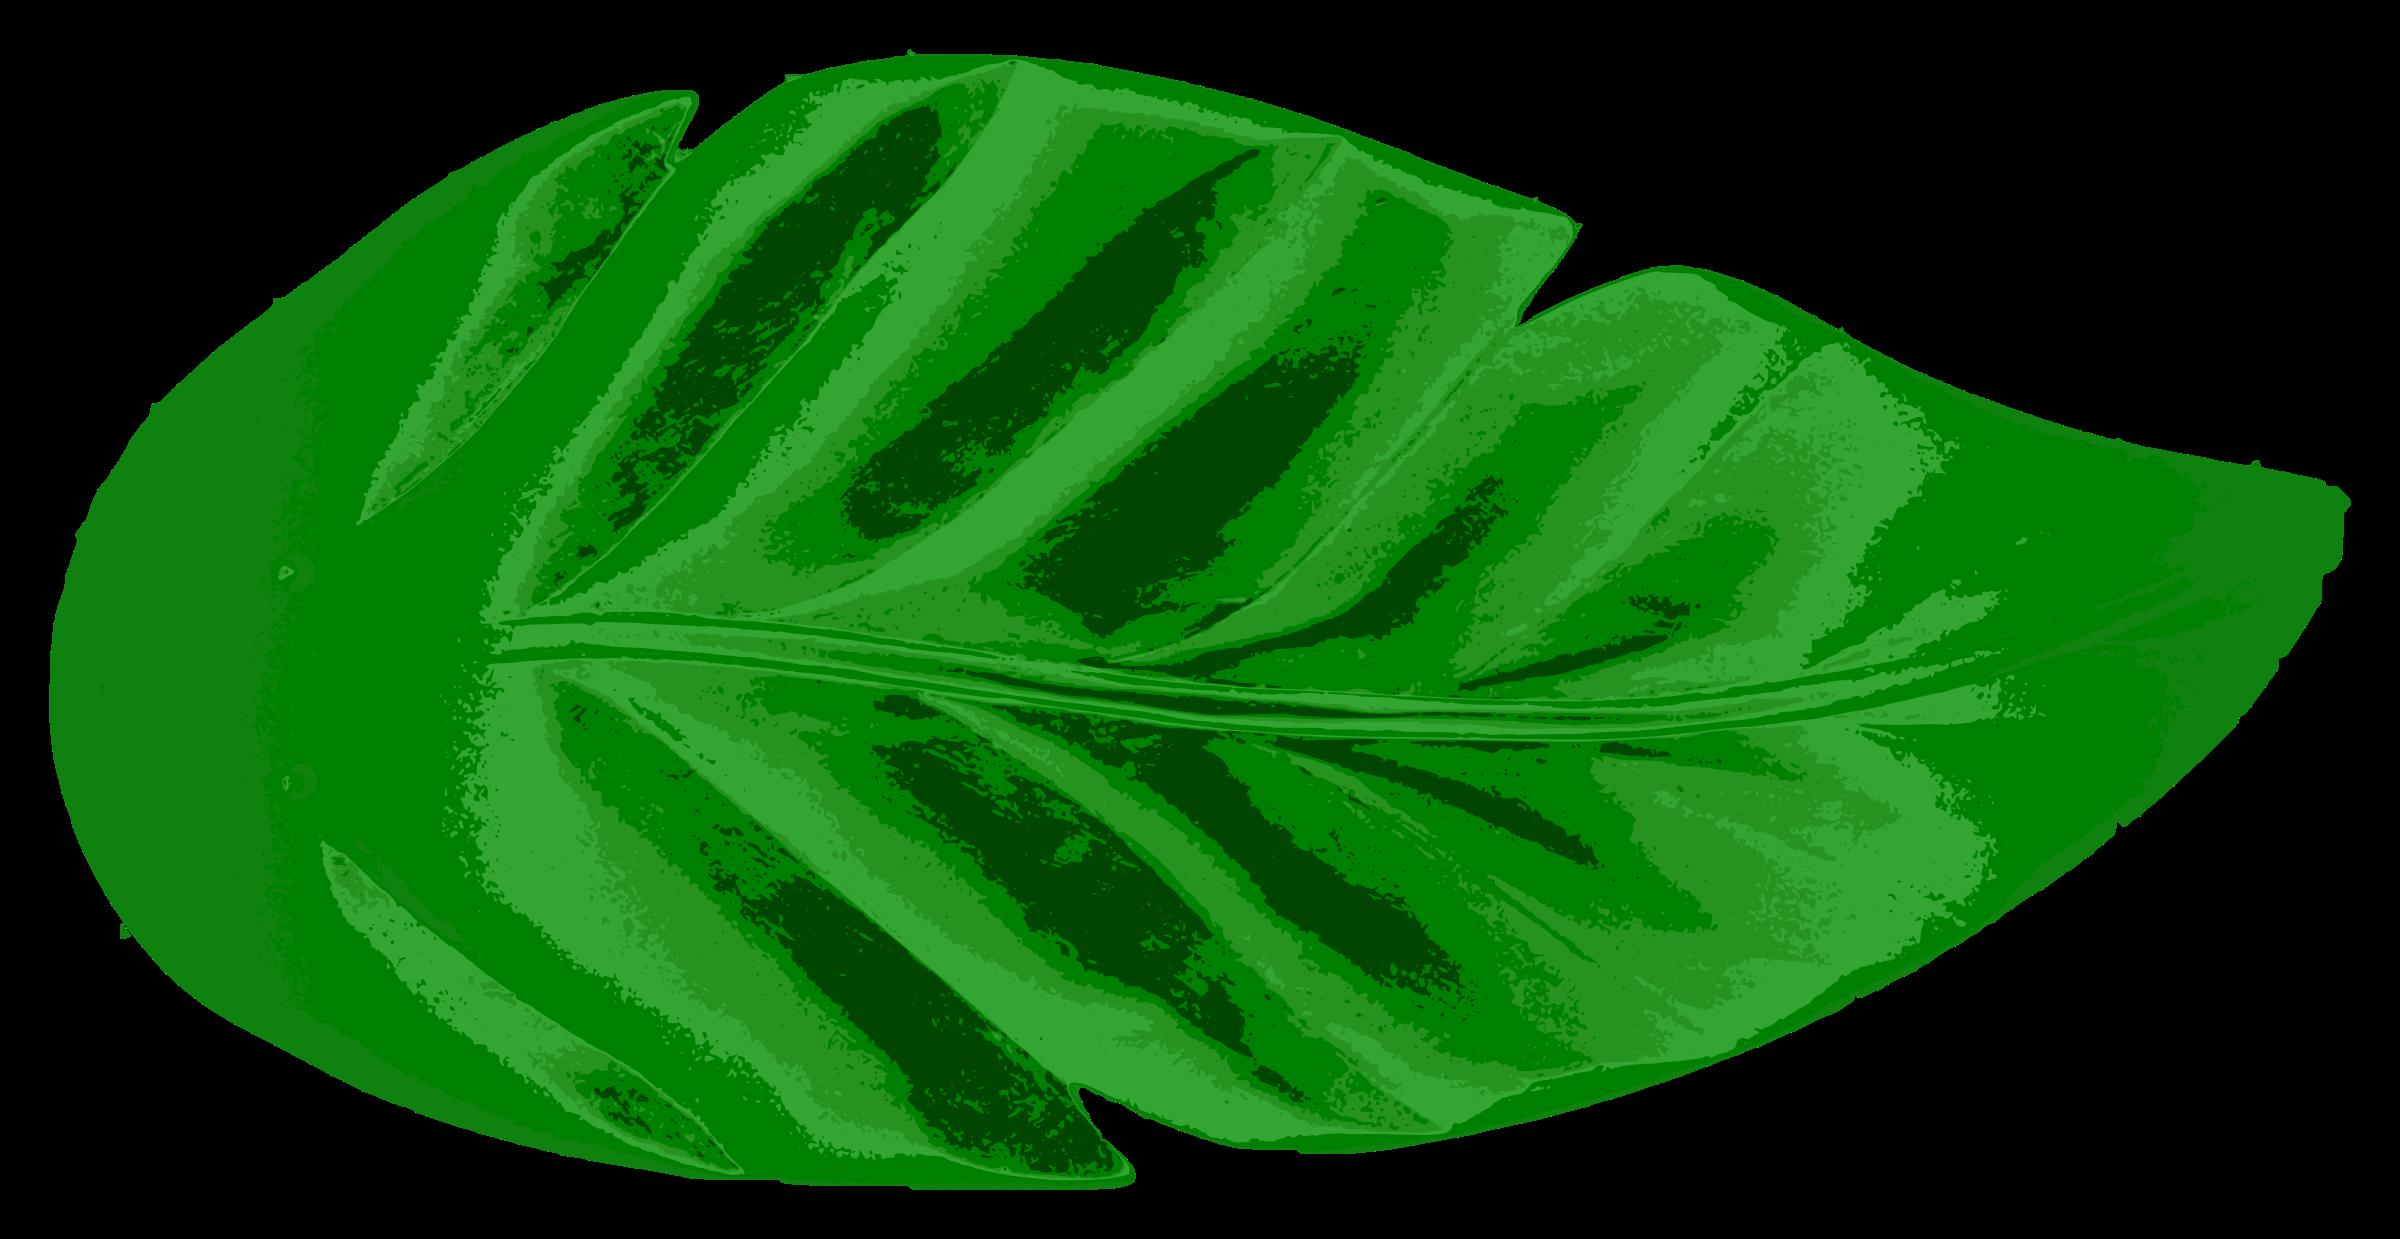 Clipart leaves large leave, Clipart leaves large leave.